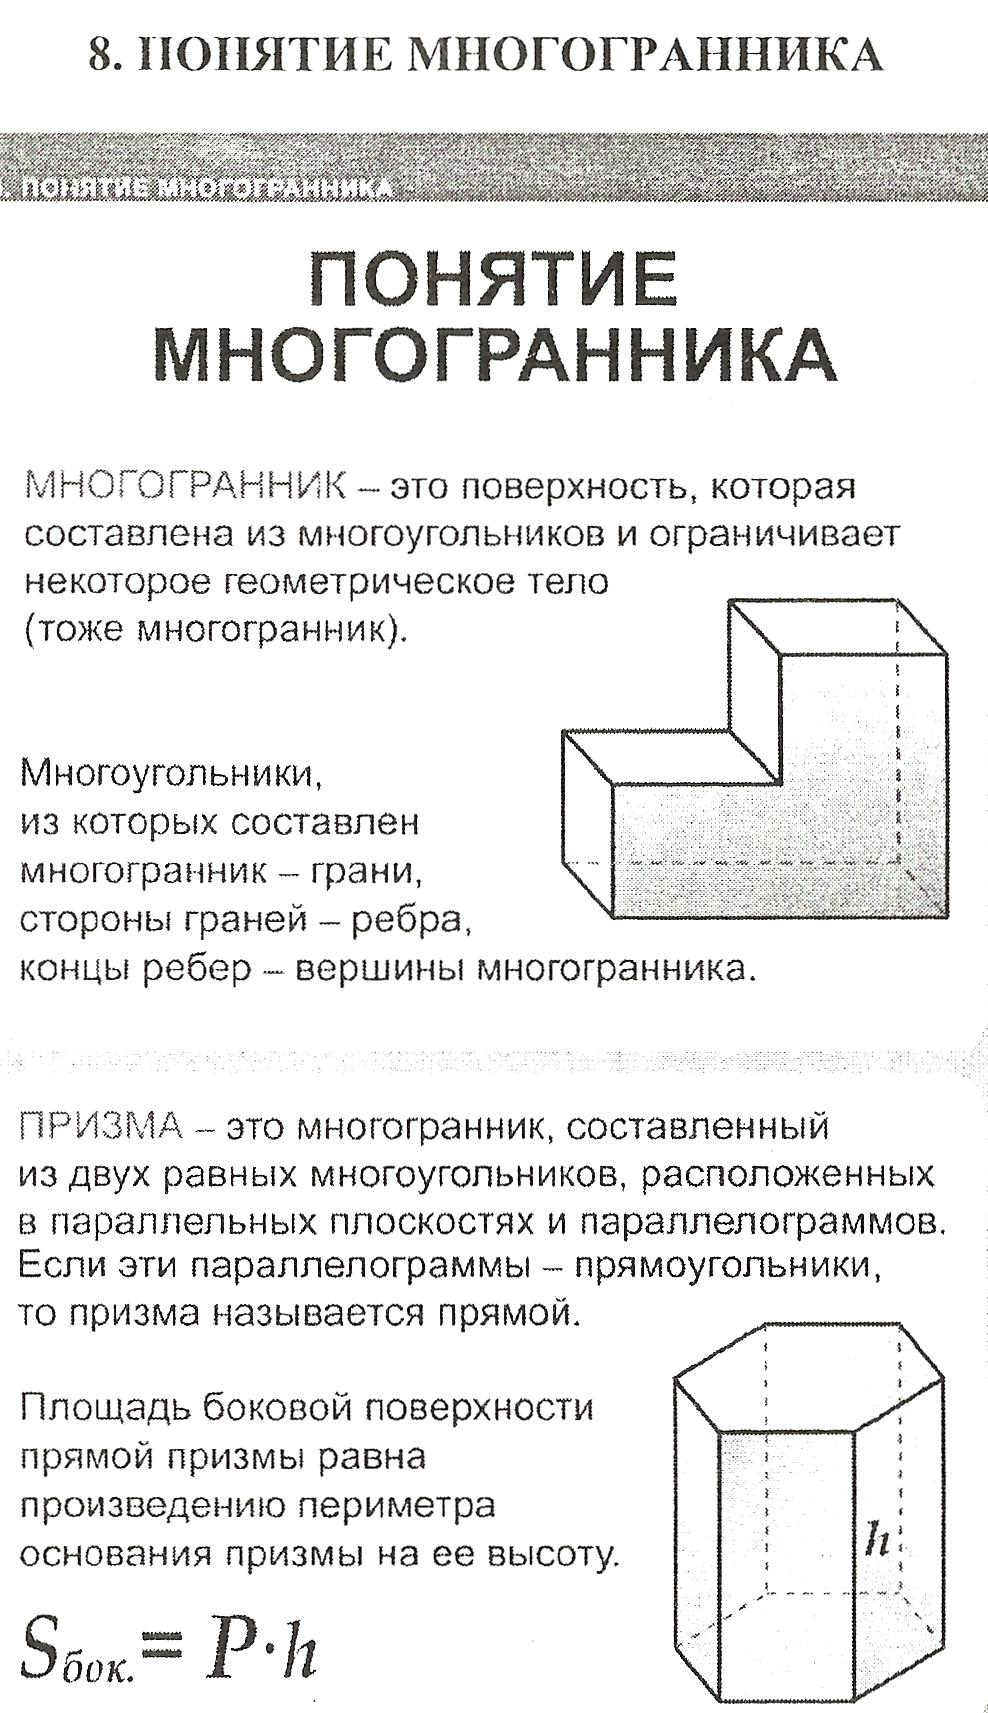 C:\Users\Татьяна\AppData\Local\Microsoft\Windows\Temporary Internet Files\Content.Word\100011.tif